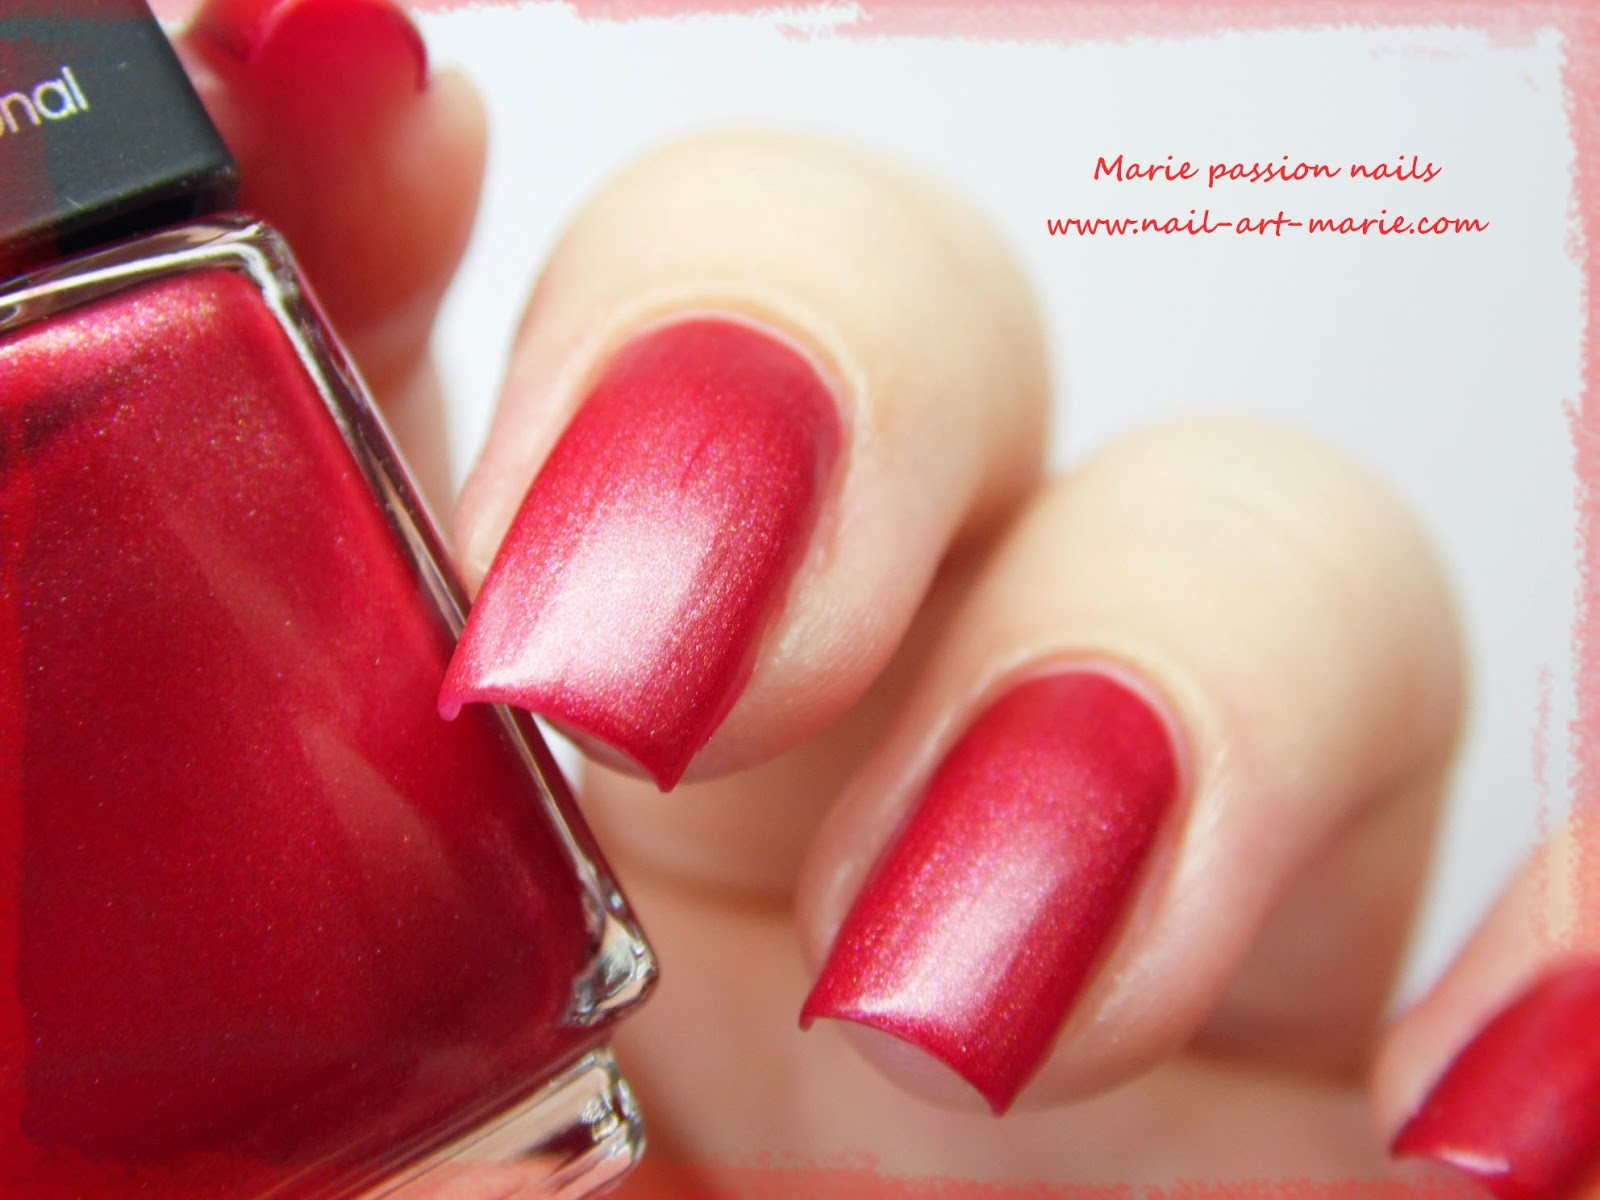 LM Cosmetic Organsini3